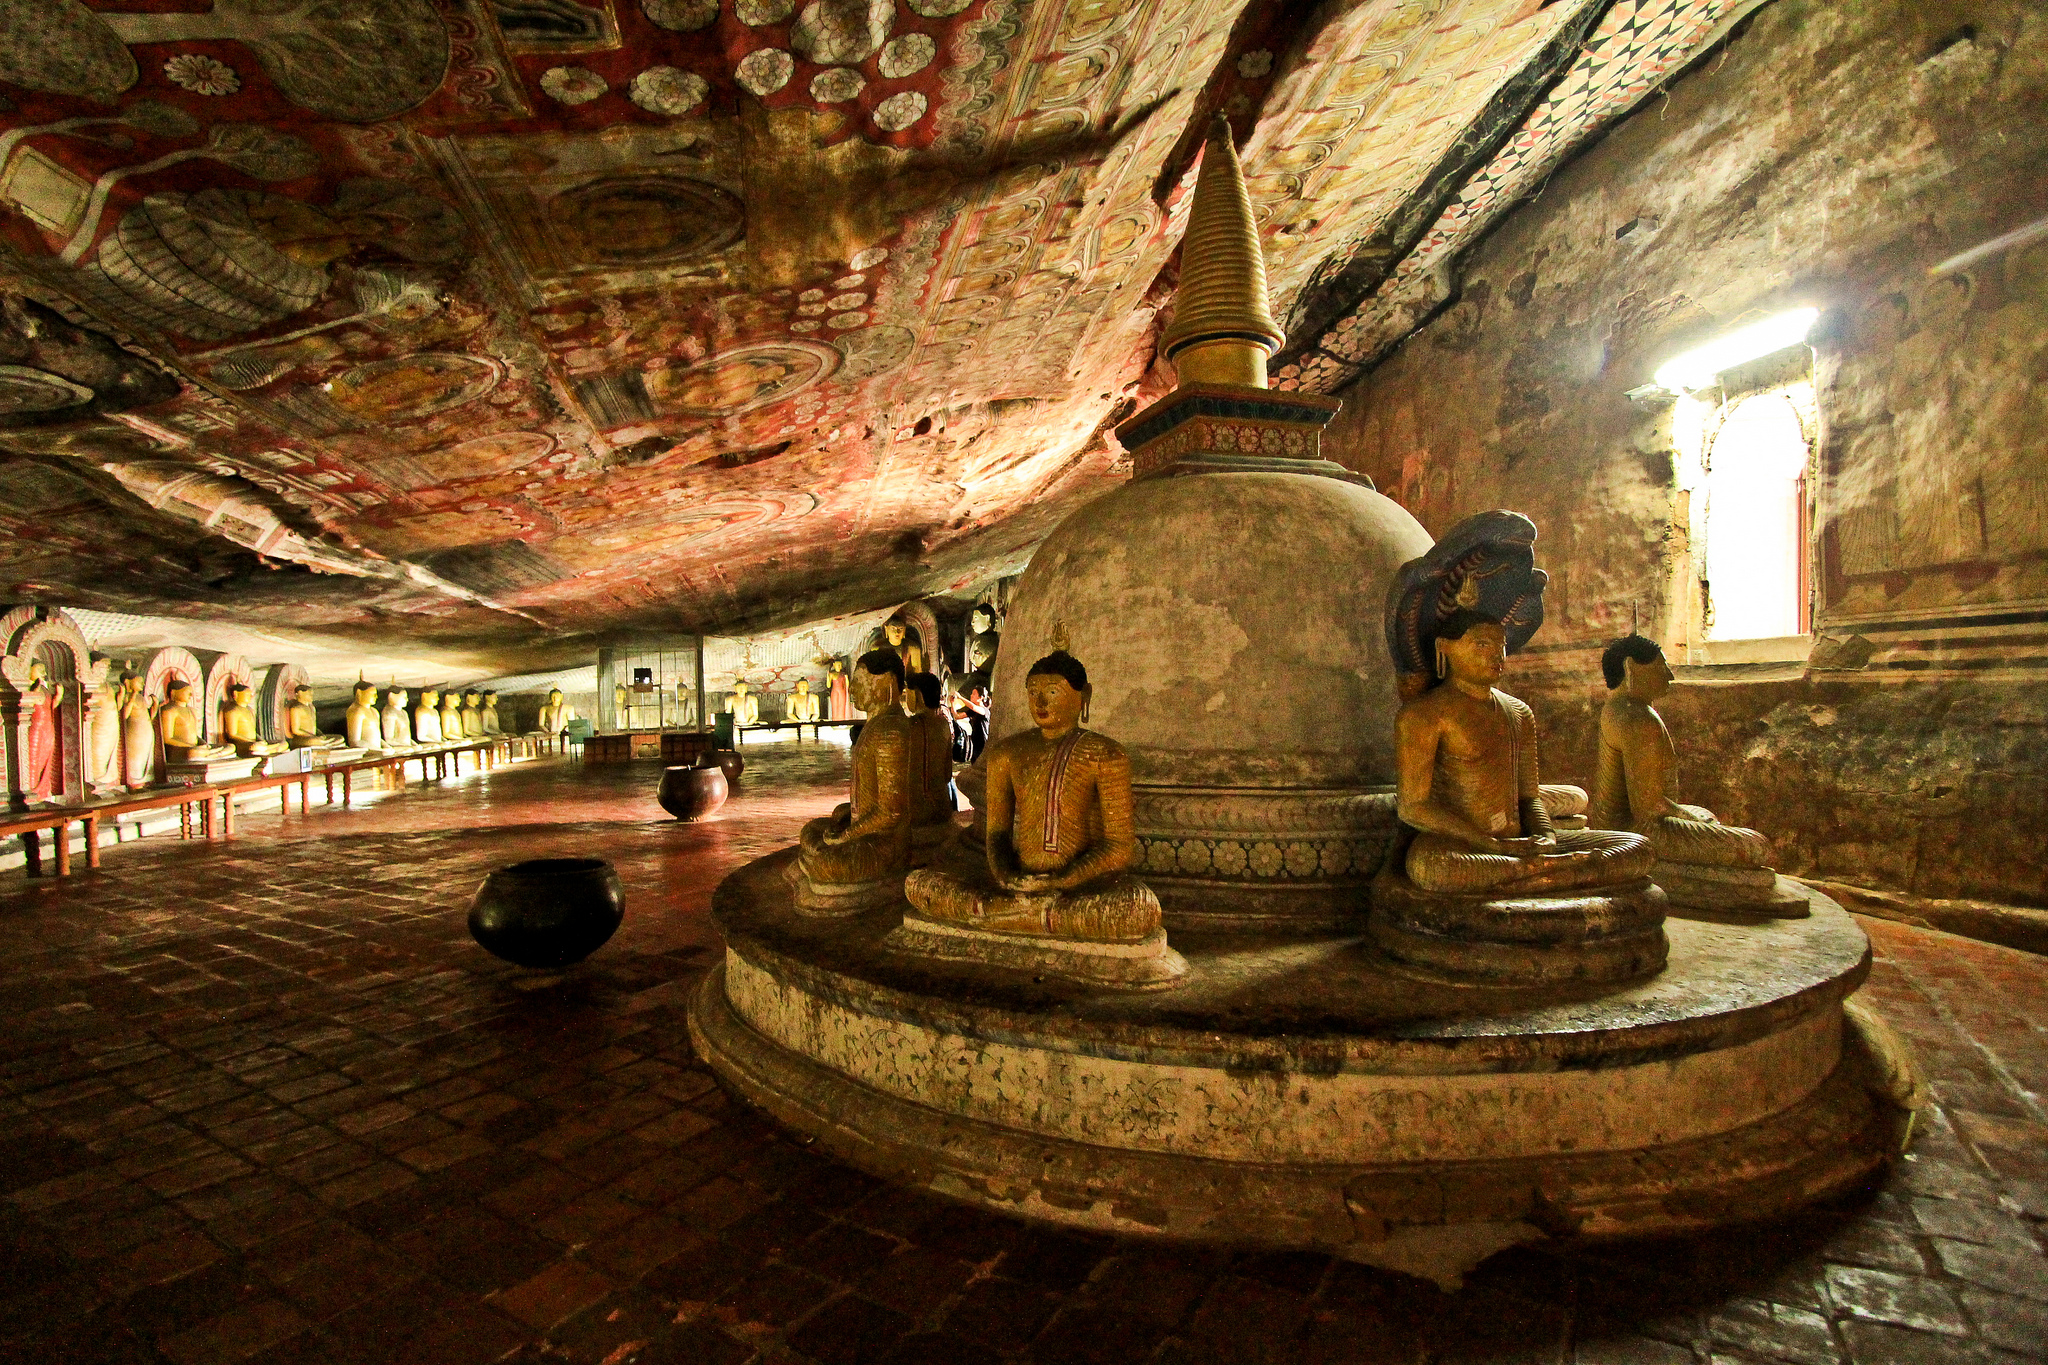 Viajar a Sri Lanka en enero - Cuevas de Dambulla